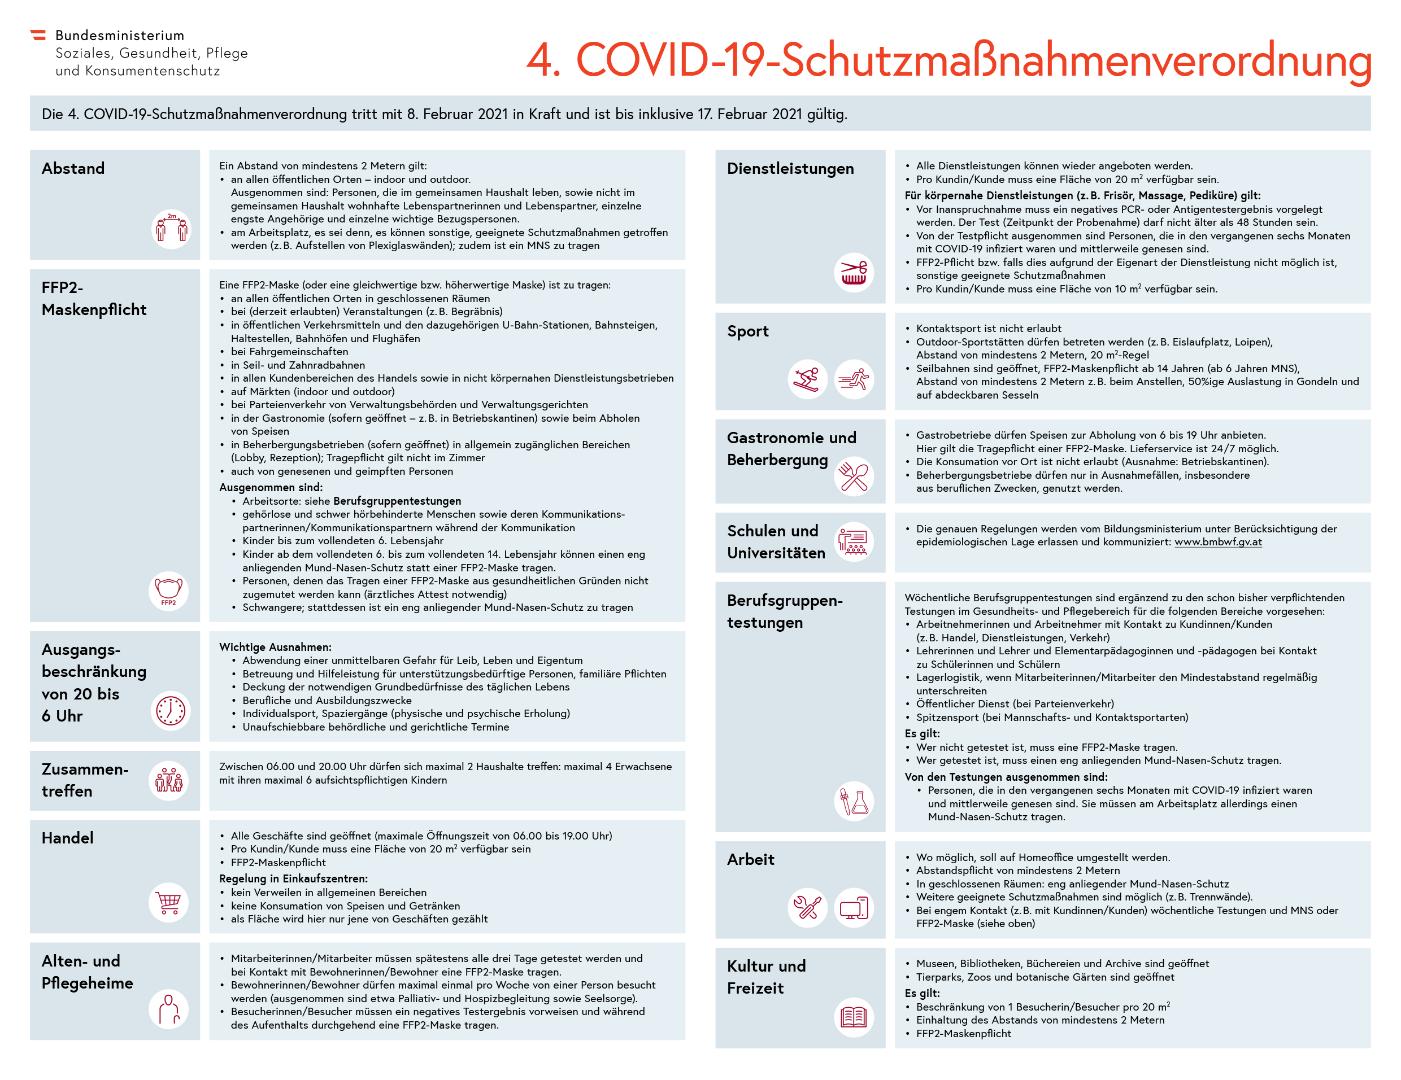 4. COVID-19-Schutzmaßnahmenverordnung.png